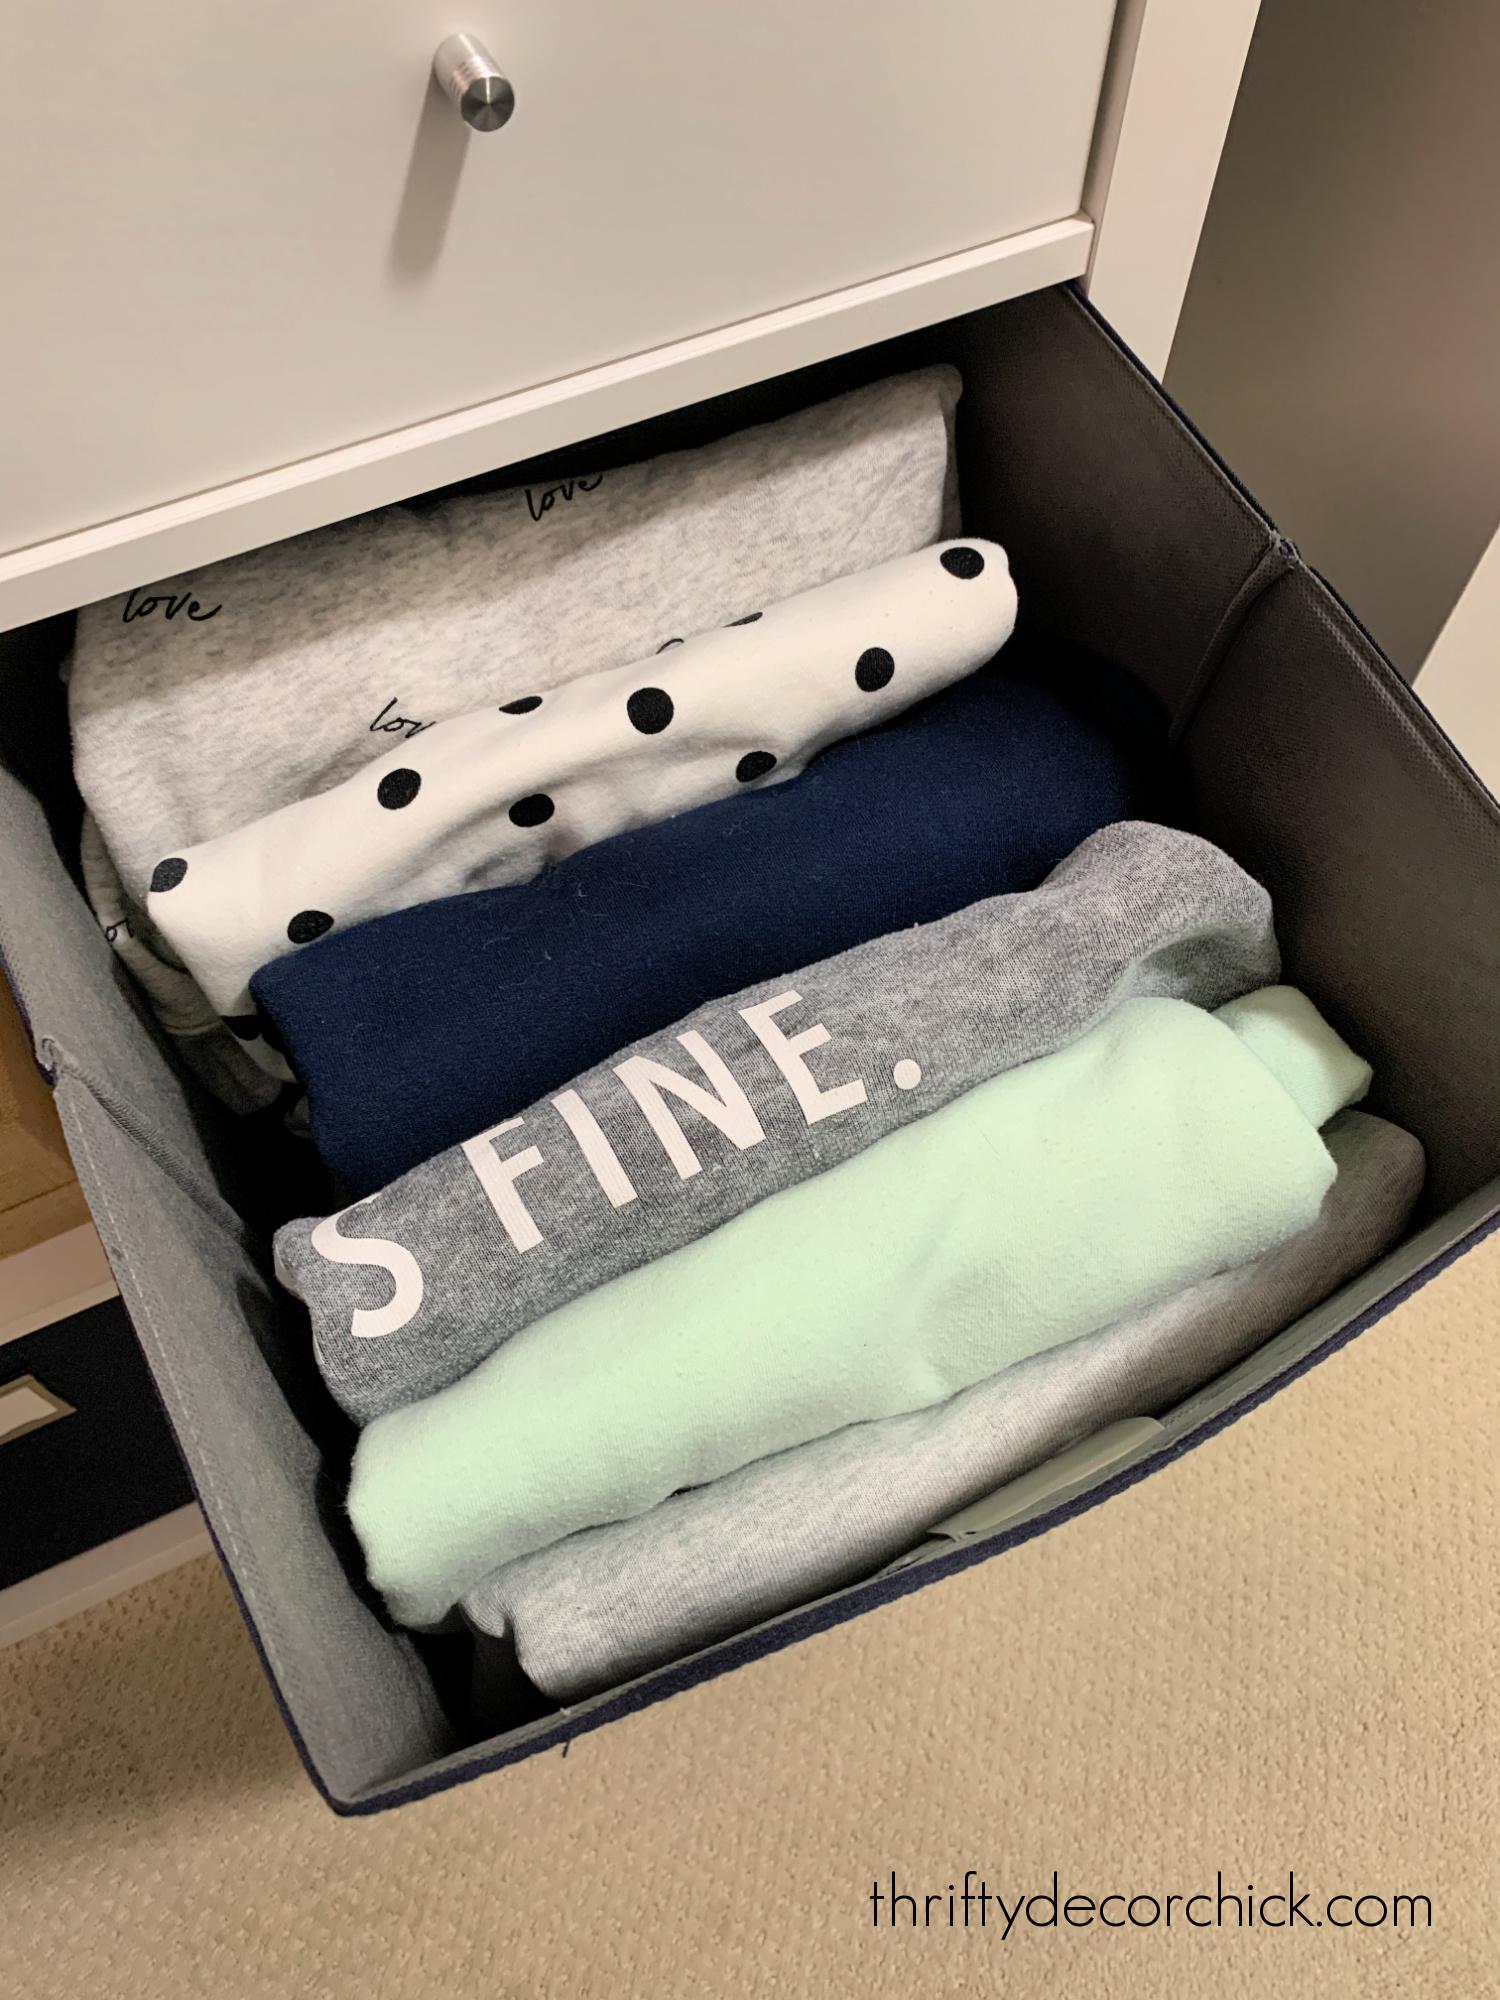 storing bulky sweatshirts in bins